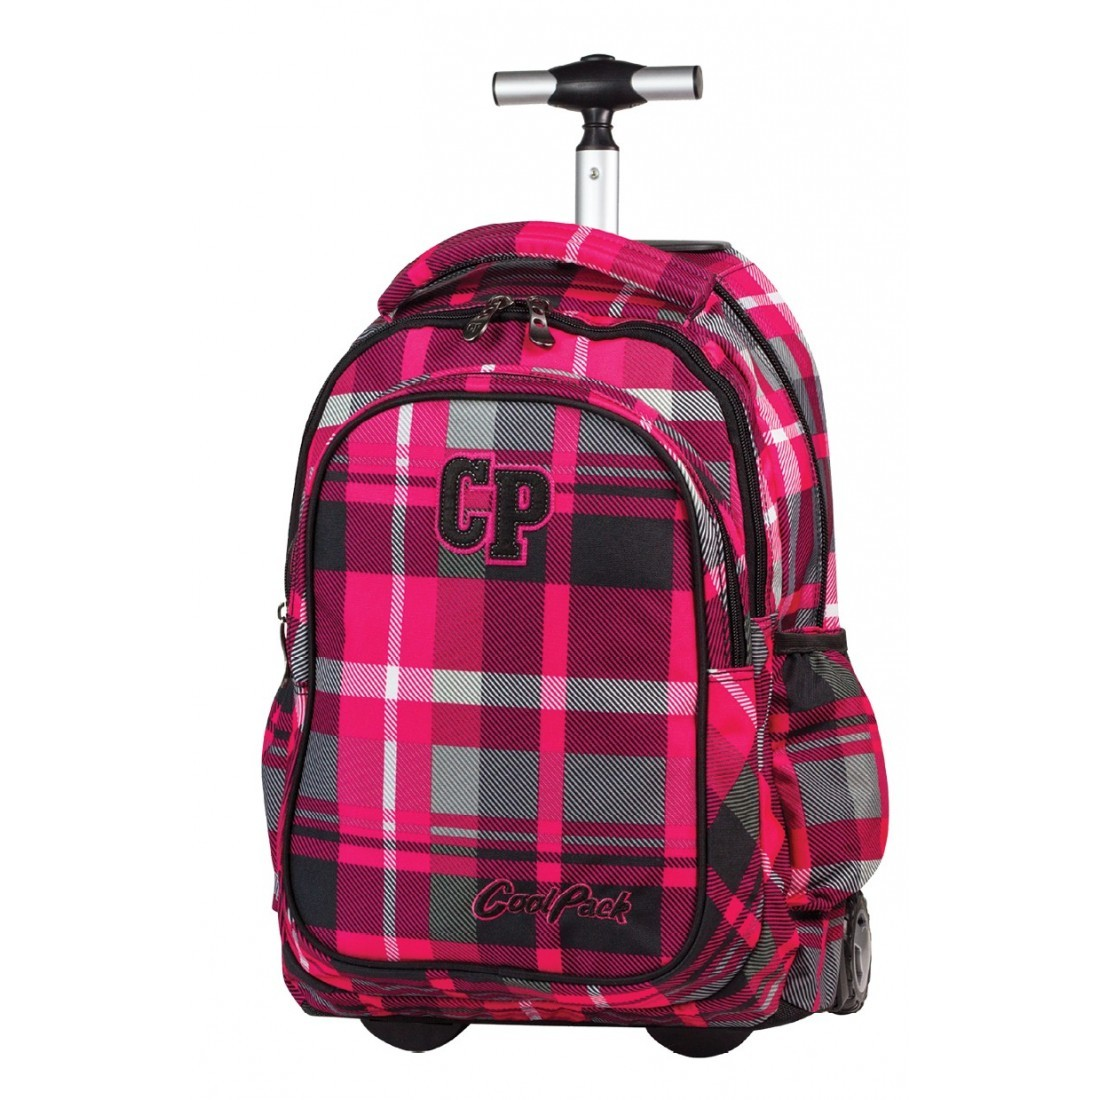 Plecak na kółkach CoolPack Junior RUBIN CP 103a - plecak-tornister.pl